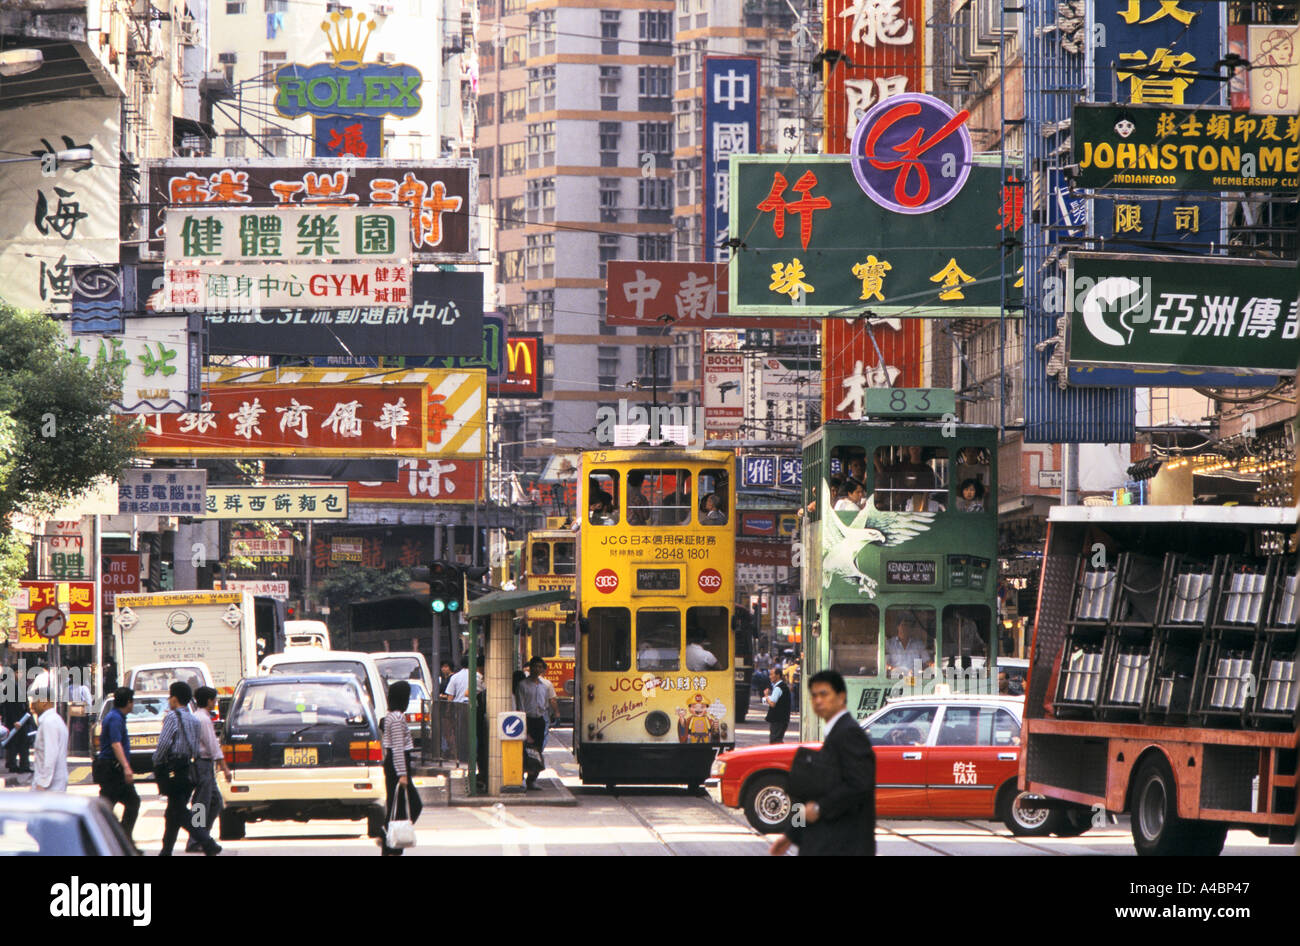 Hong Kong Streets Traffic Scene Stock Photo Royalty Free